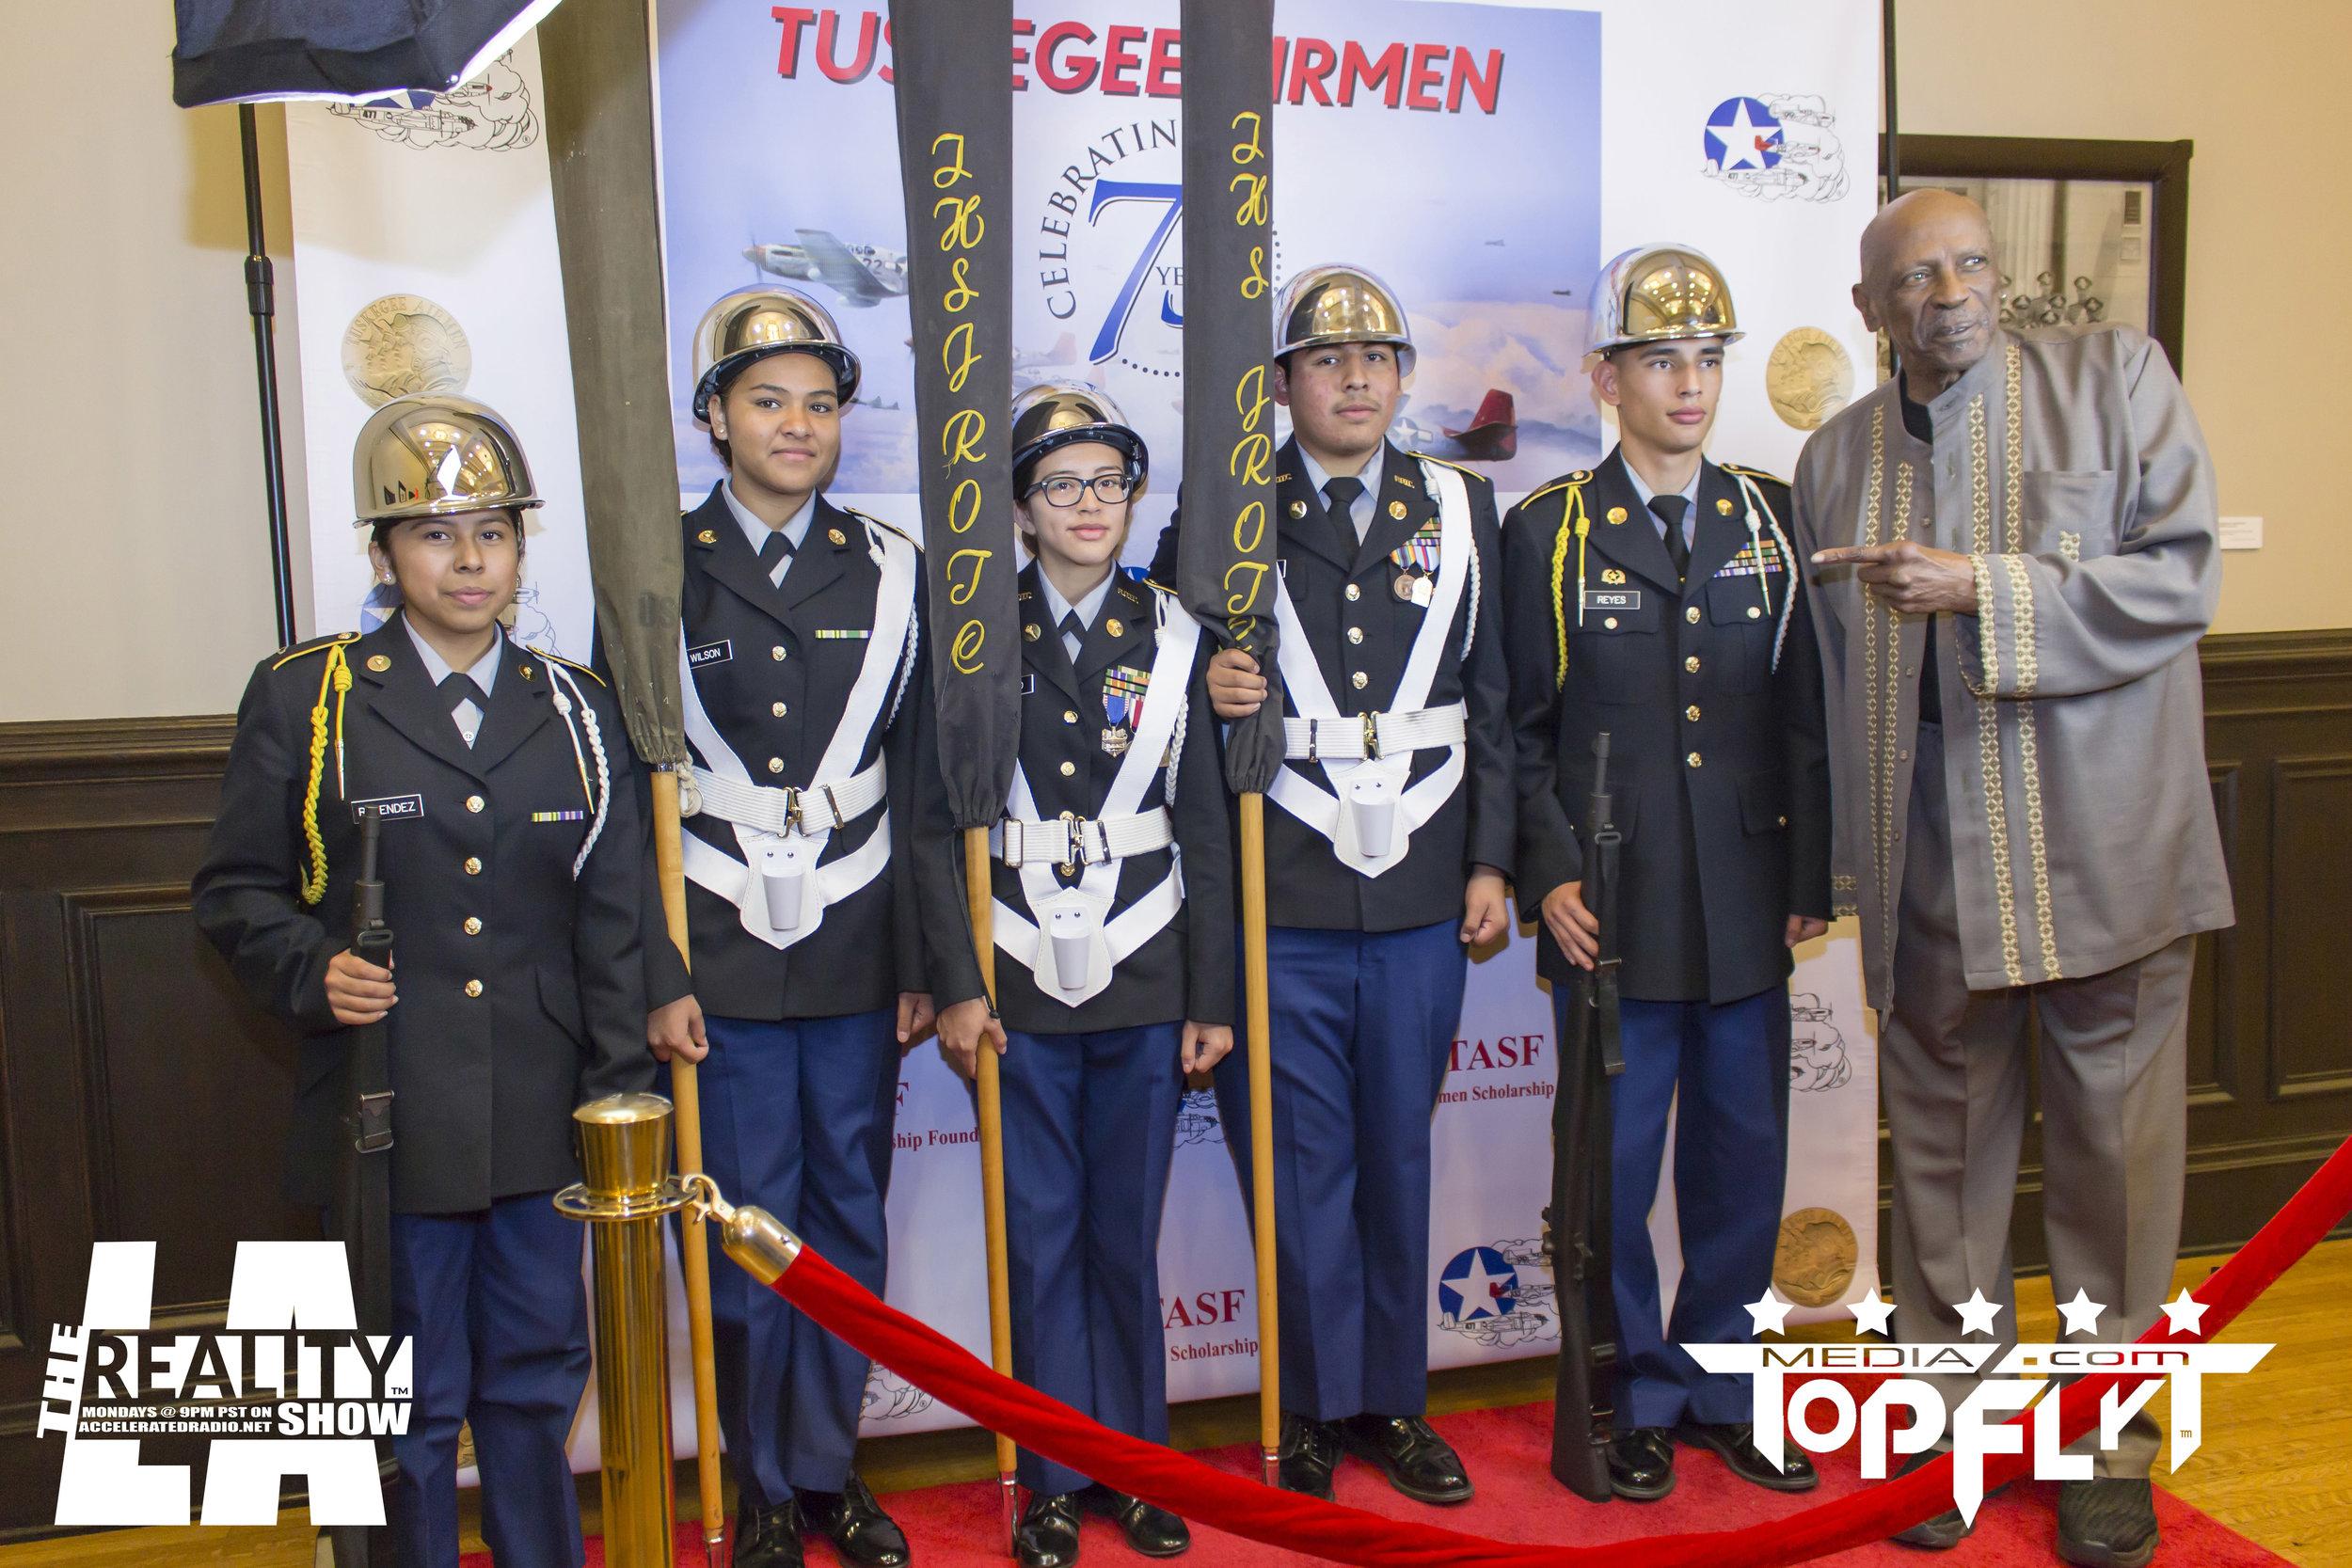 The Reality Show LA - Tuskegee Airmen 75th Anniversary VIP Reception_158.jpg